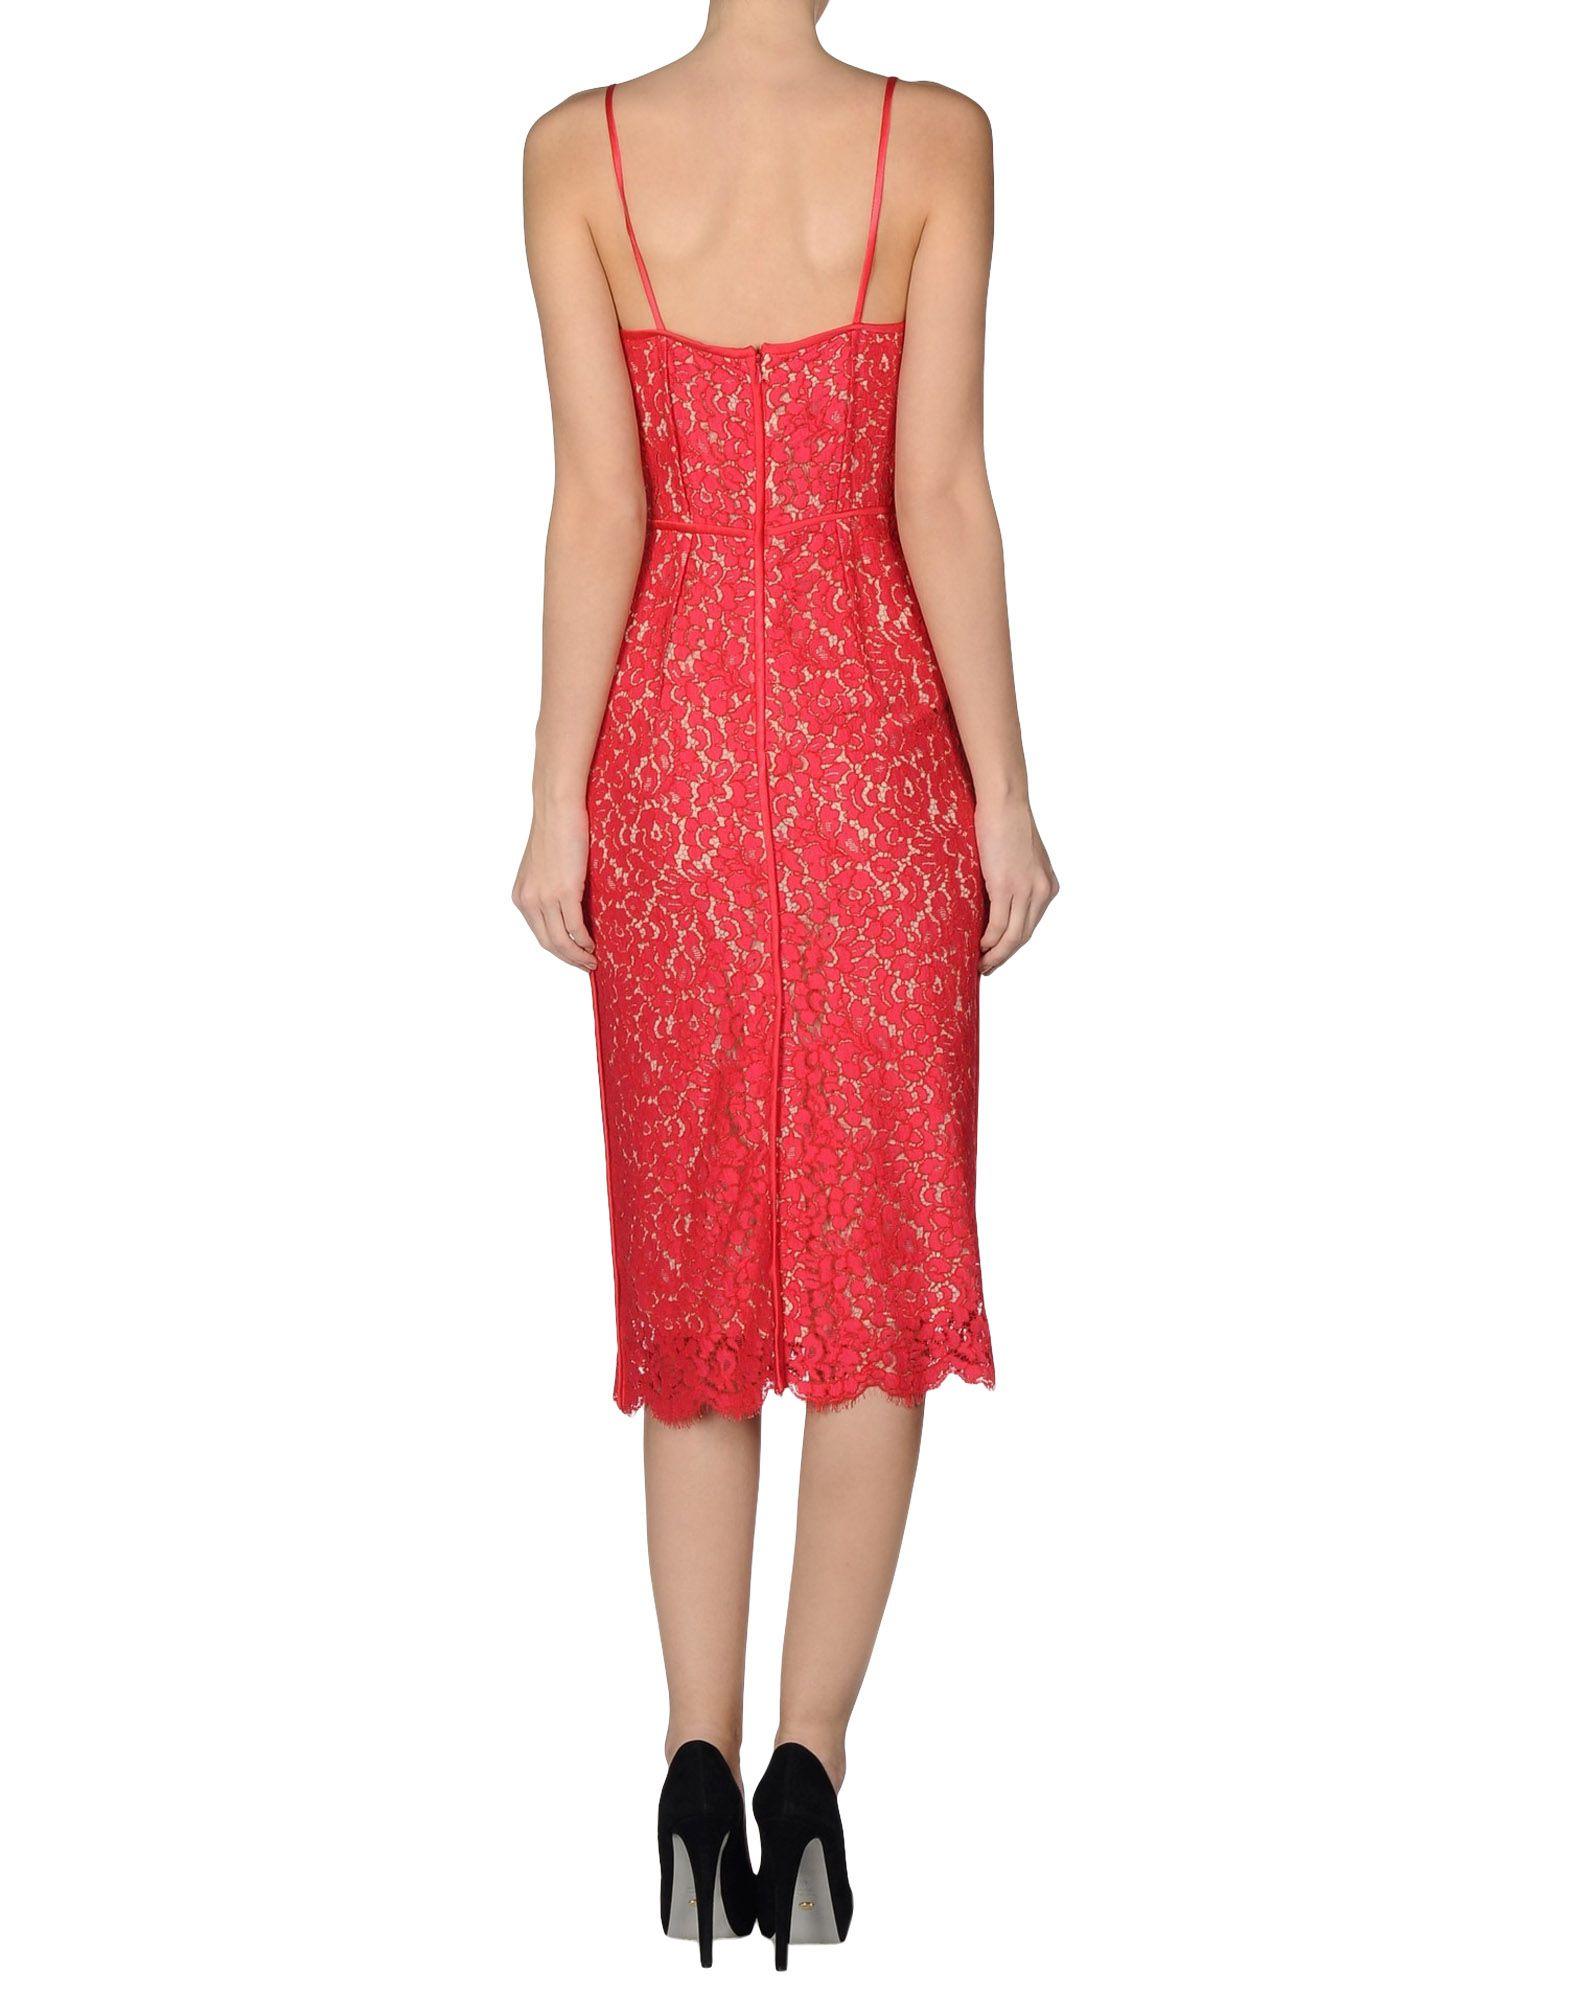 Lyst - Michael Kors 34 Length Dress in Red